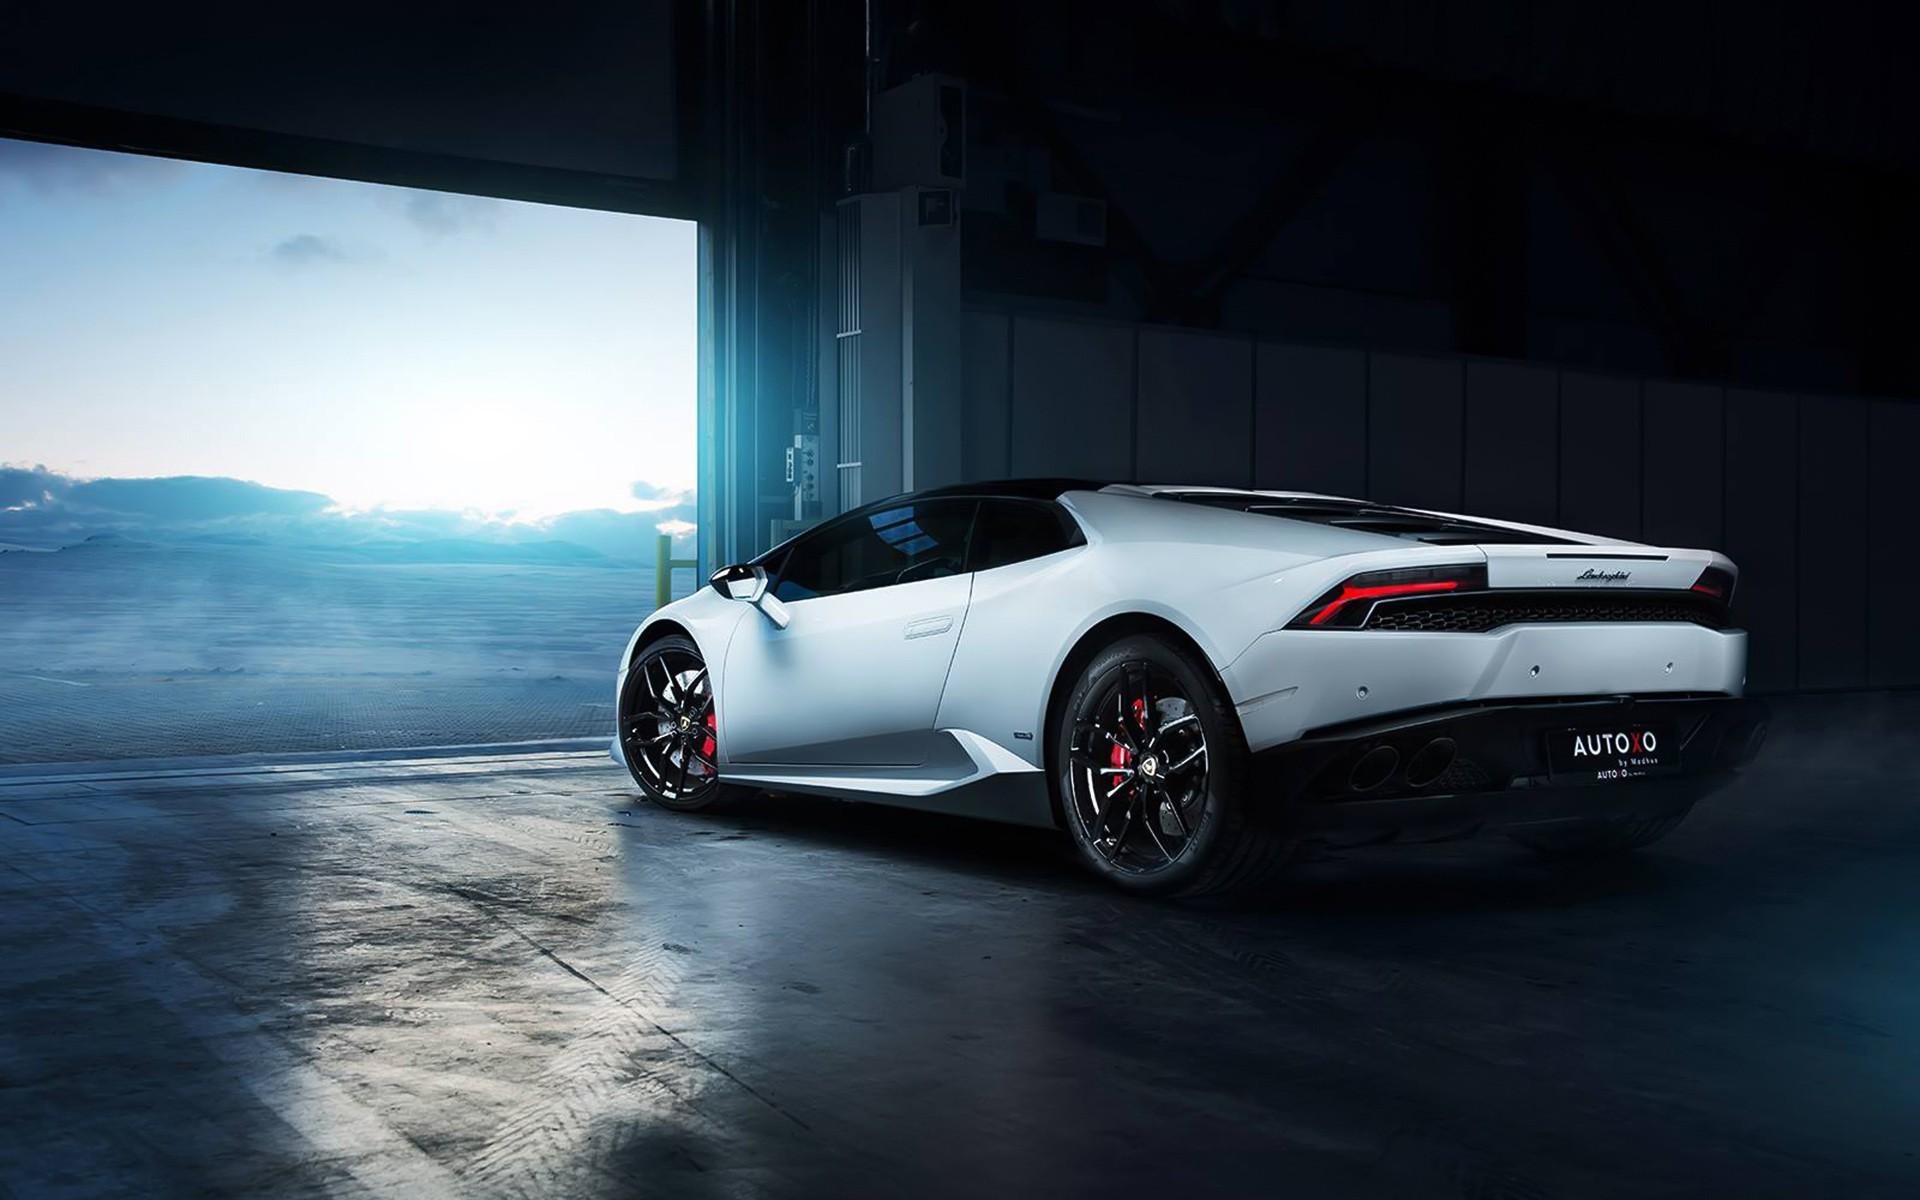 Lamborghini Huracan LP610 4 Wallpaper | HD Car Wallpapers ...